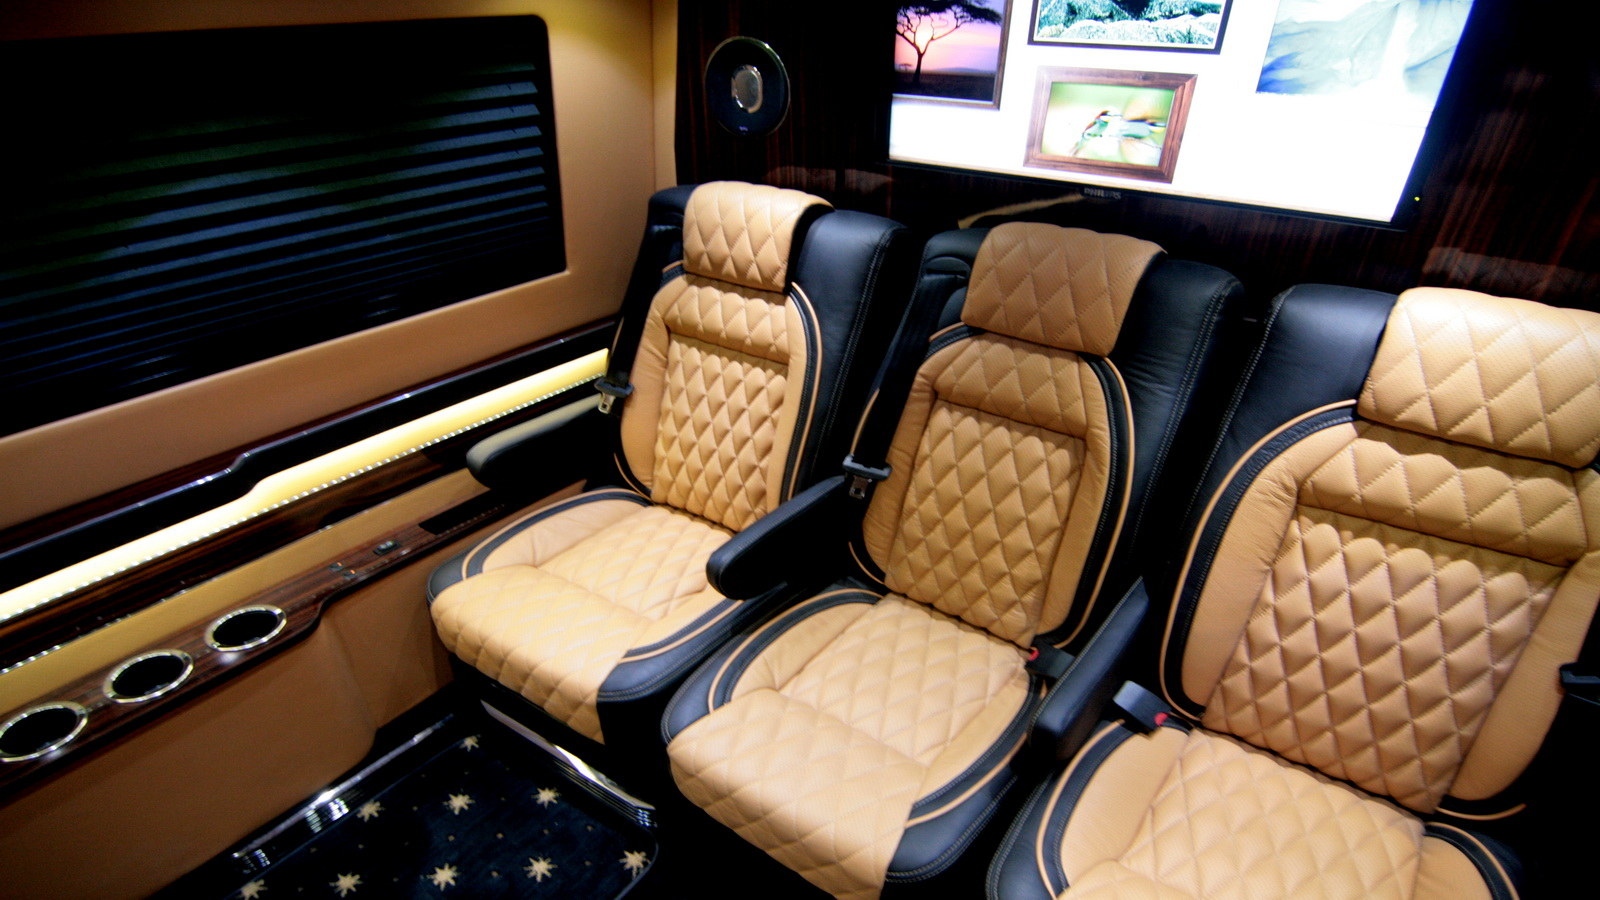 Sport Car Collections Jayde Mercedes Benz Customized: Custom Mercedes-Benz Sprinter Grand Edition Conversion